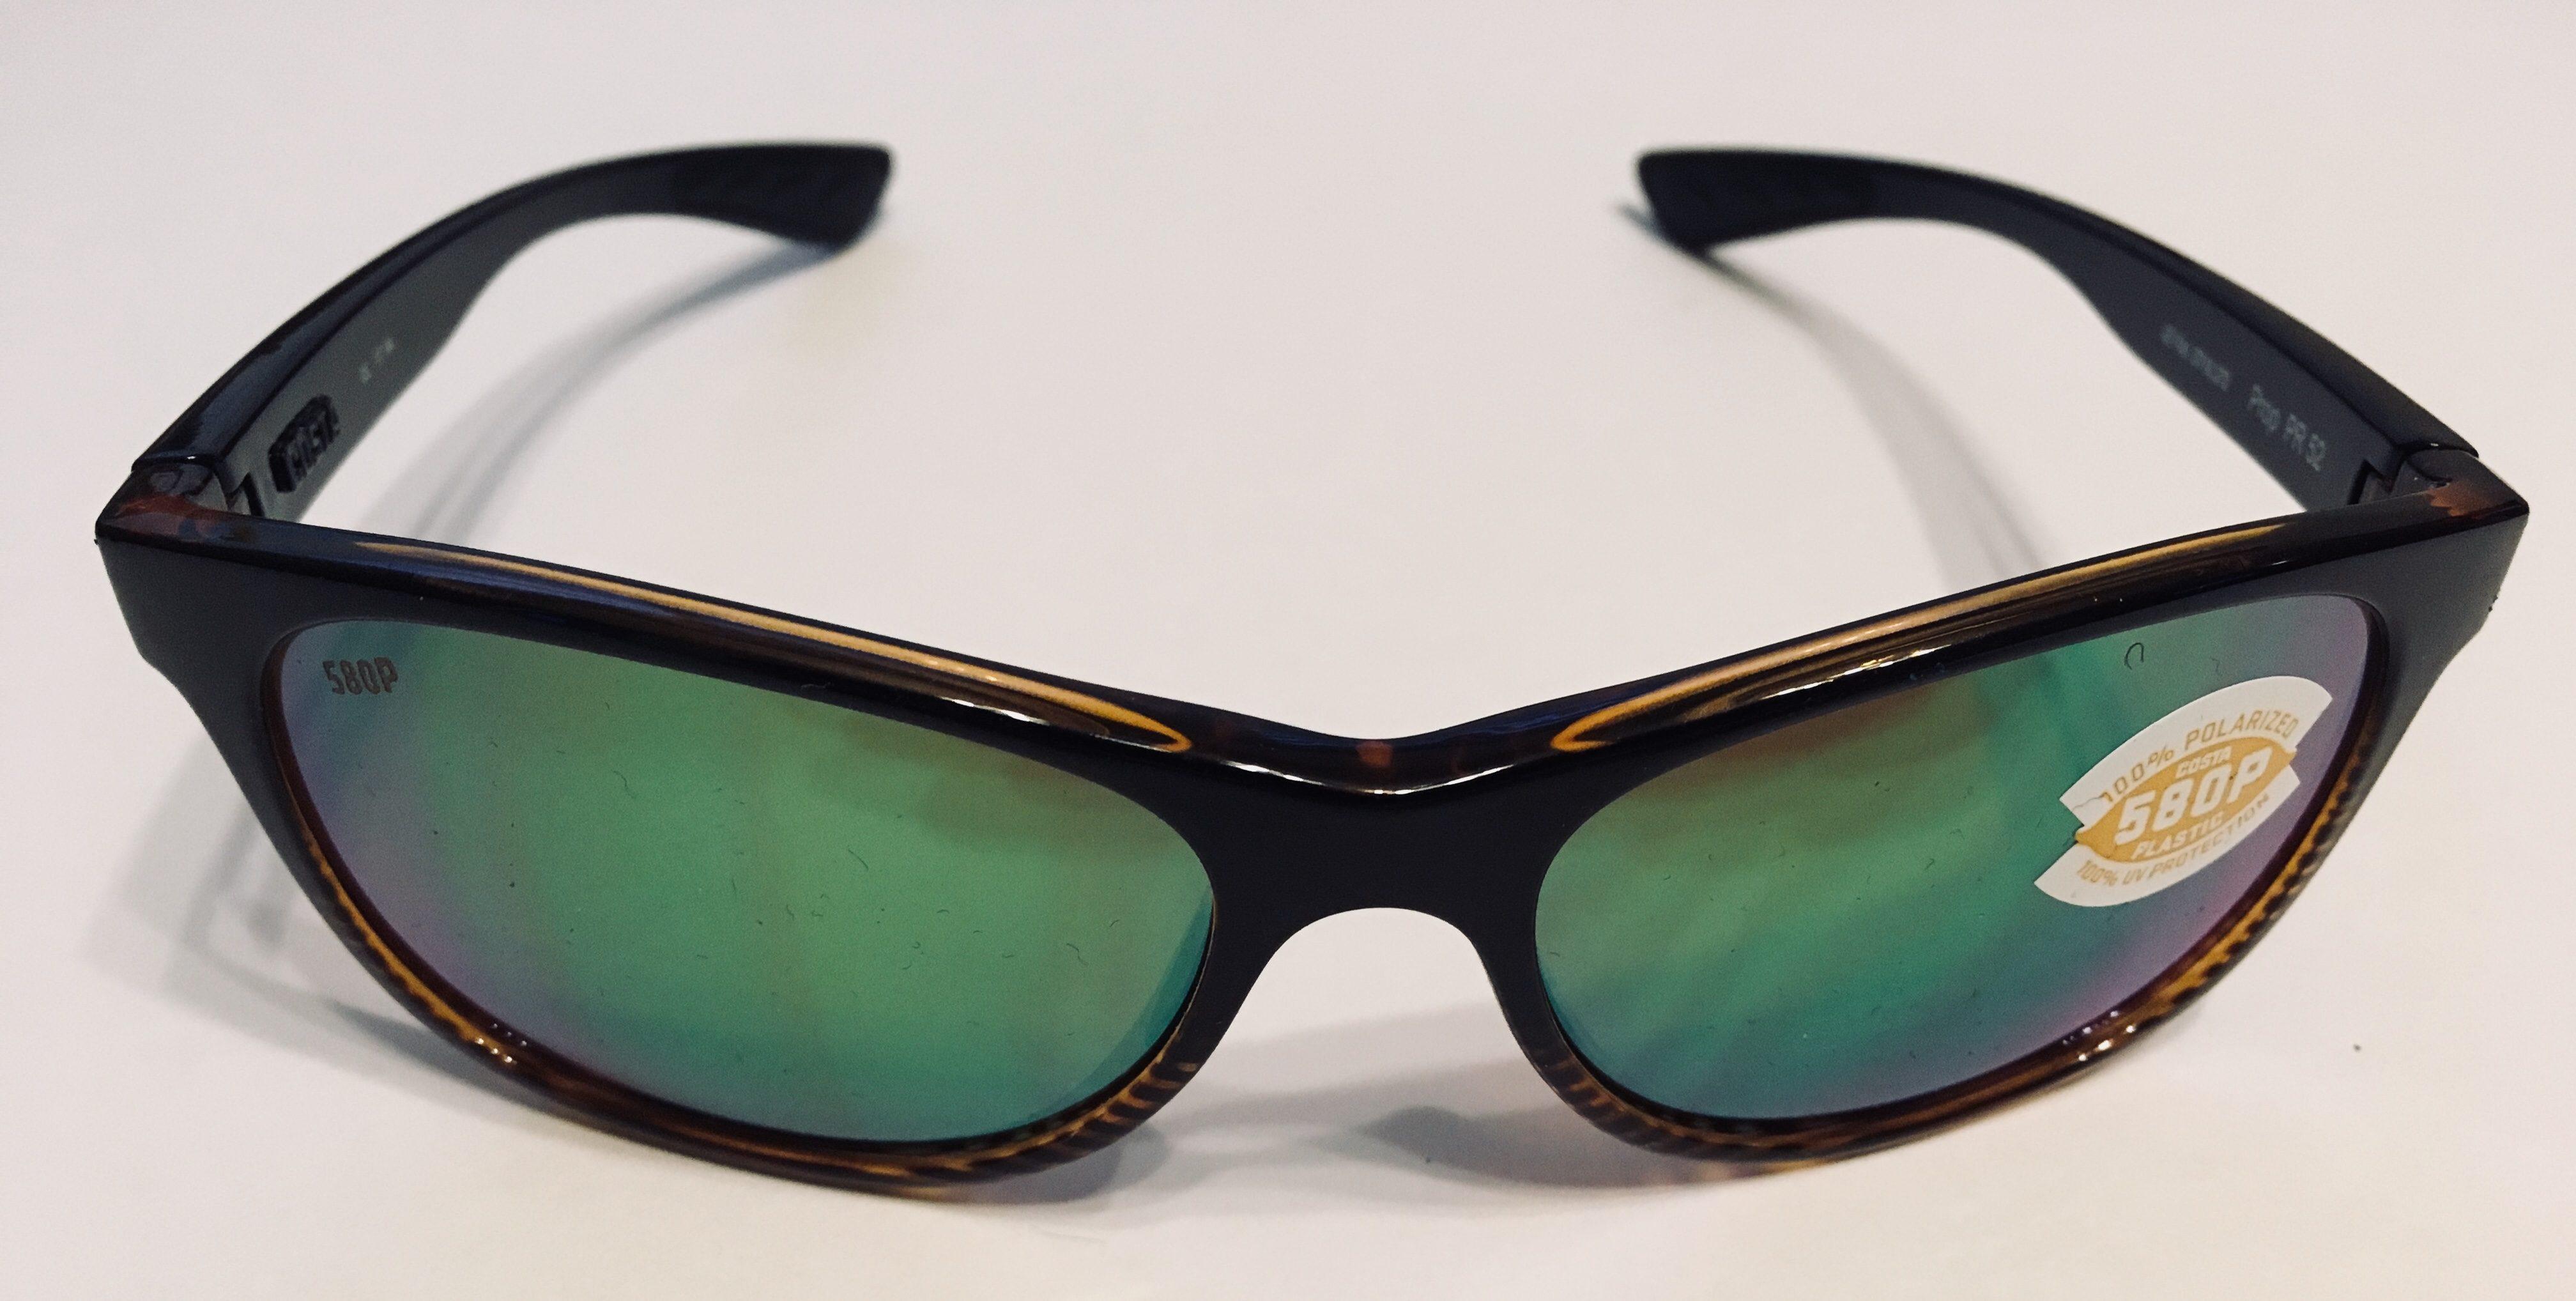 07d594fdb Costa Del Mar Prop Sunglasses - Coconut Fade POLARIZED Green Mirror 580P